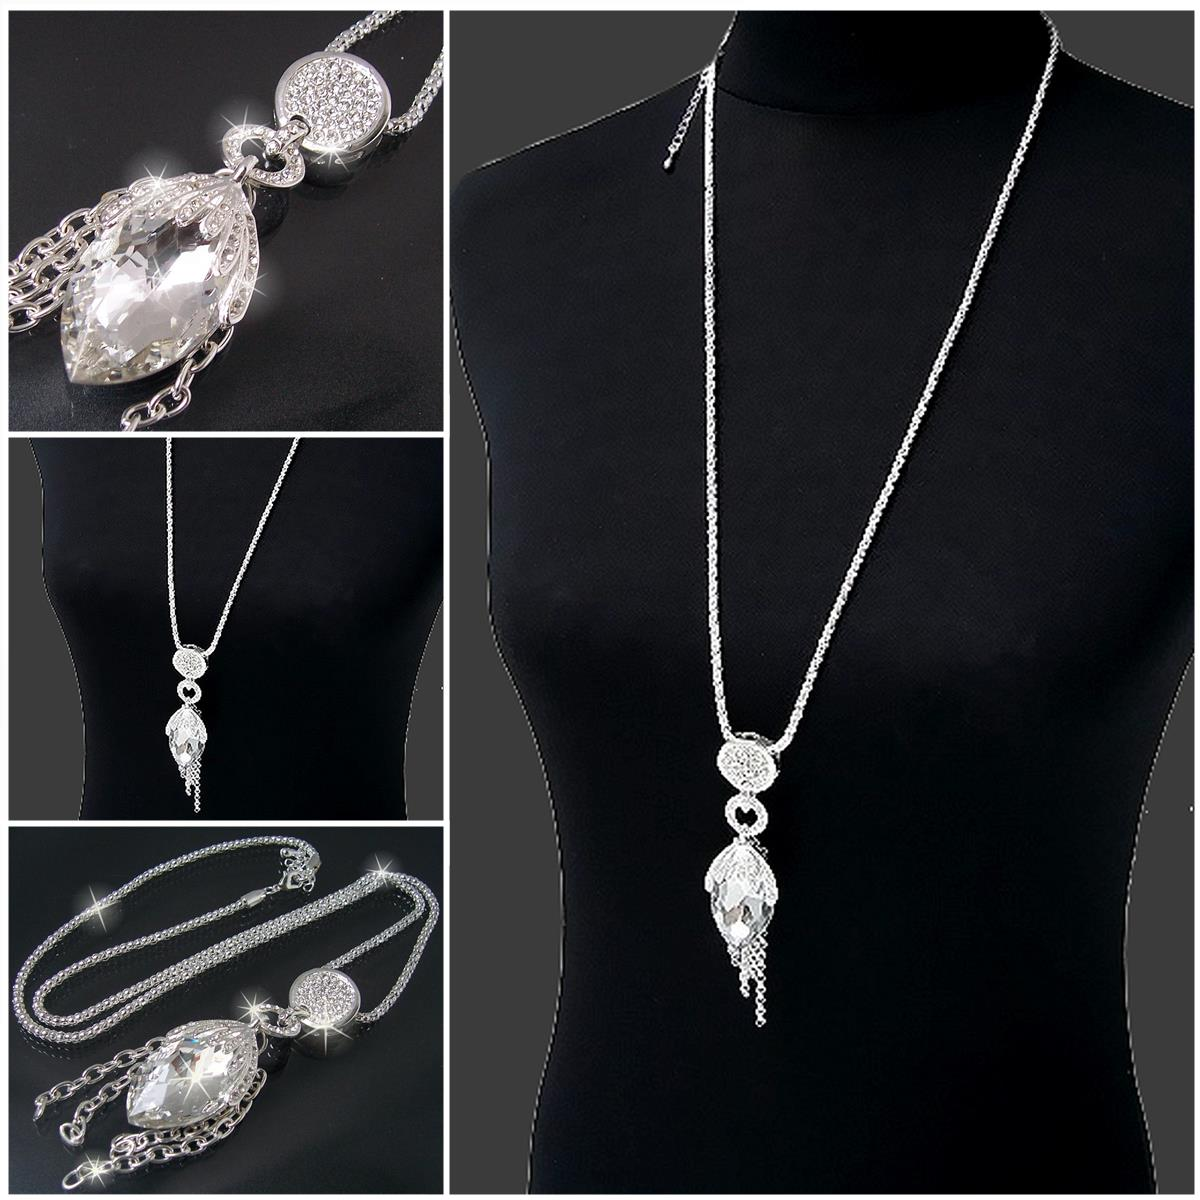 Lange ketten  Lange Halskette Kette Silber Gold mit Anhänger Strass Zirkonia ...